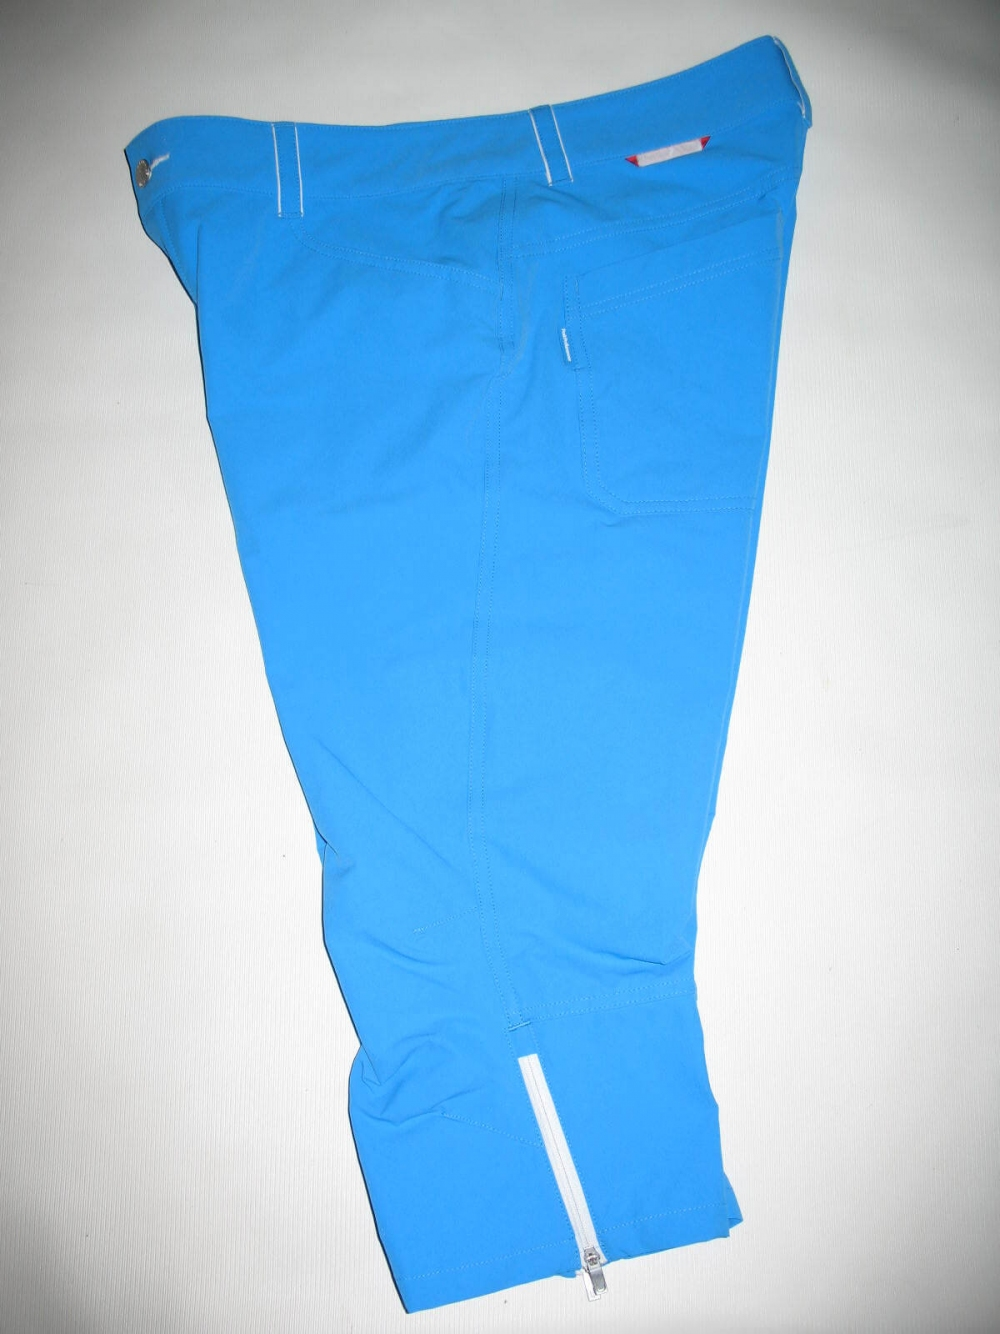 Шорты PEAK PERFOMANCE agile shorts lady (размер M) - 3